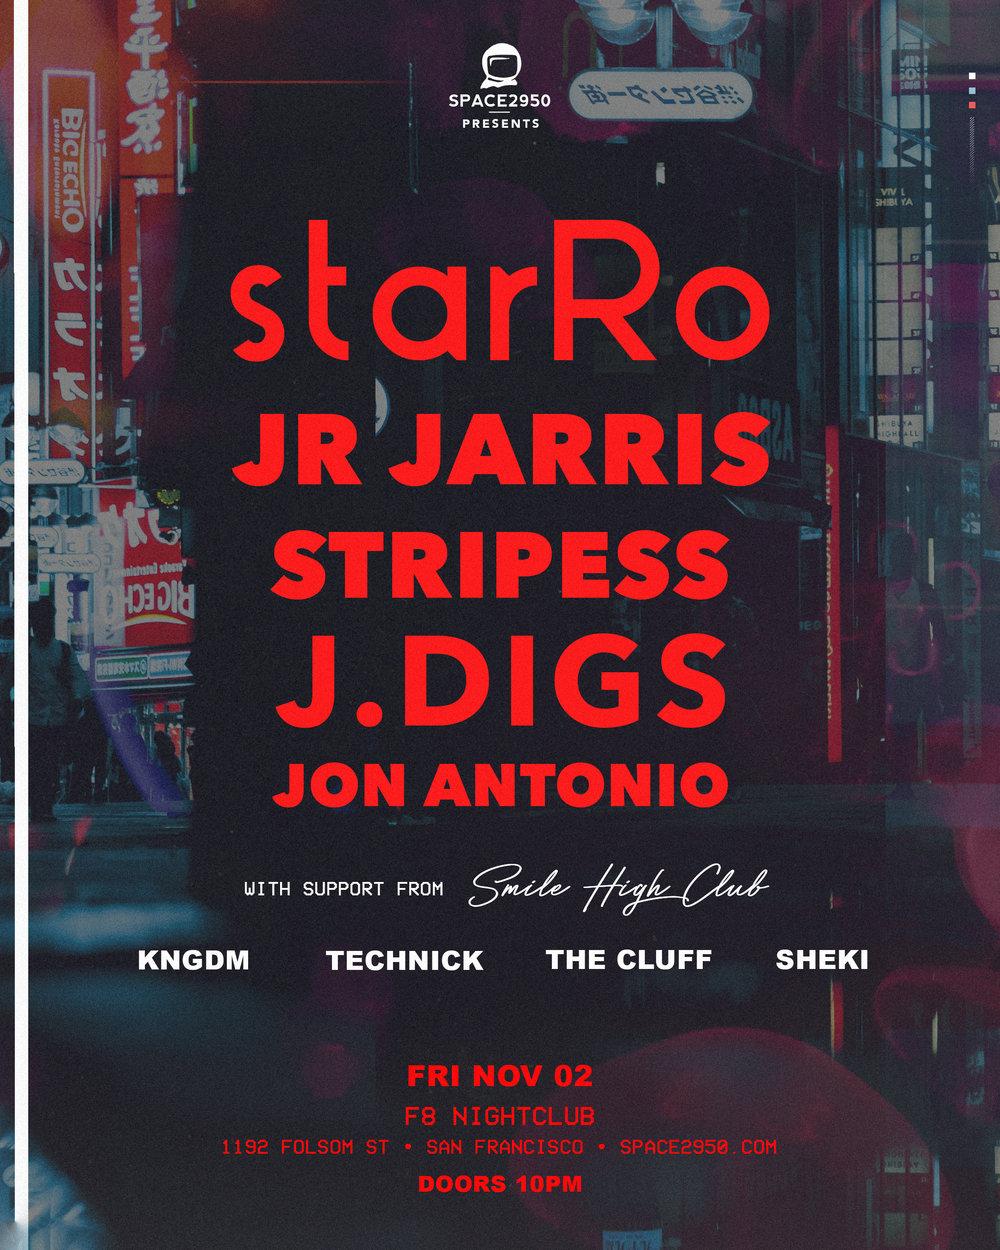 starRo + JR JARRIS Event Flyer (1).jpg